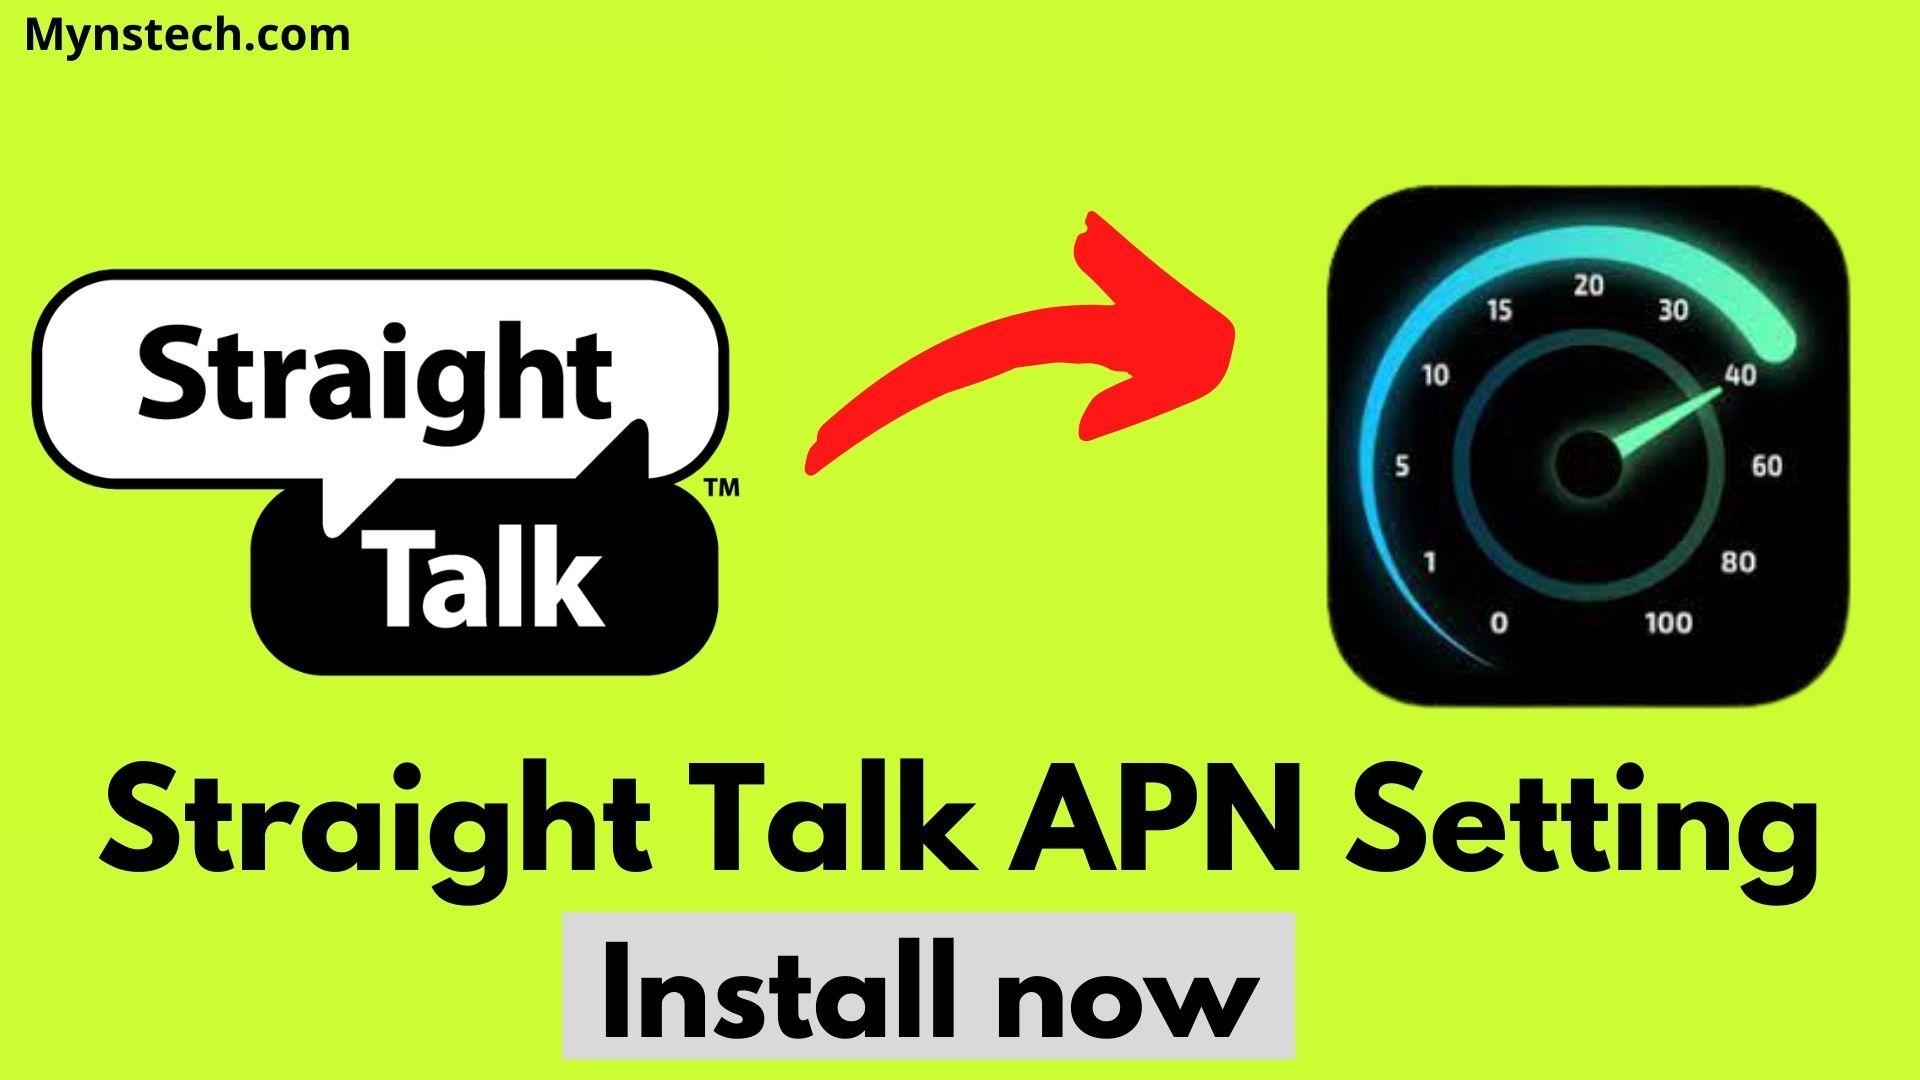 Straight Talk 4G LTE APN Setting